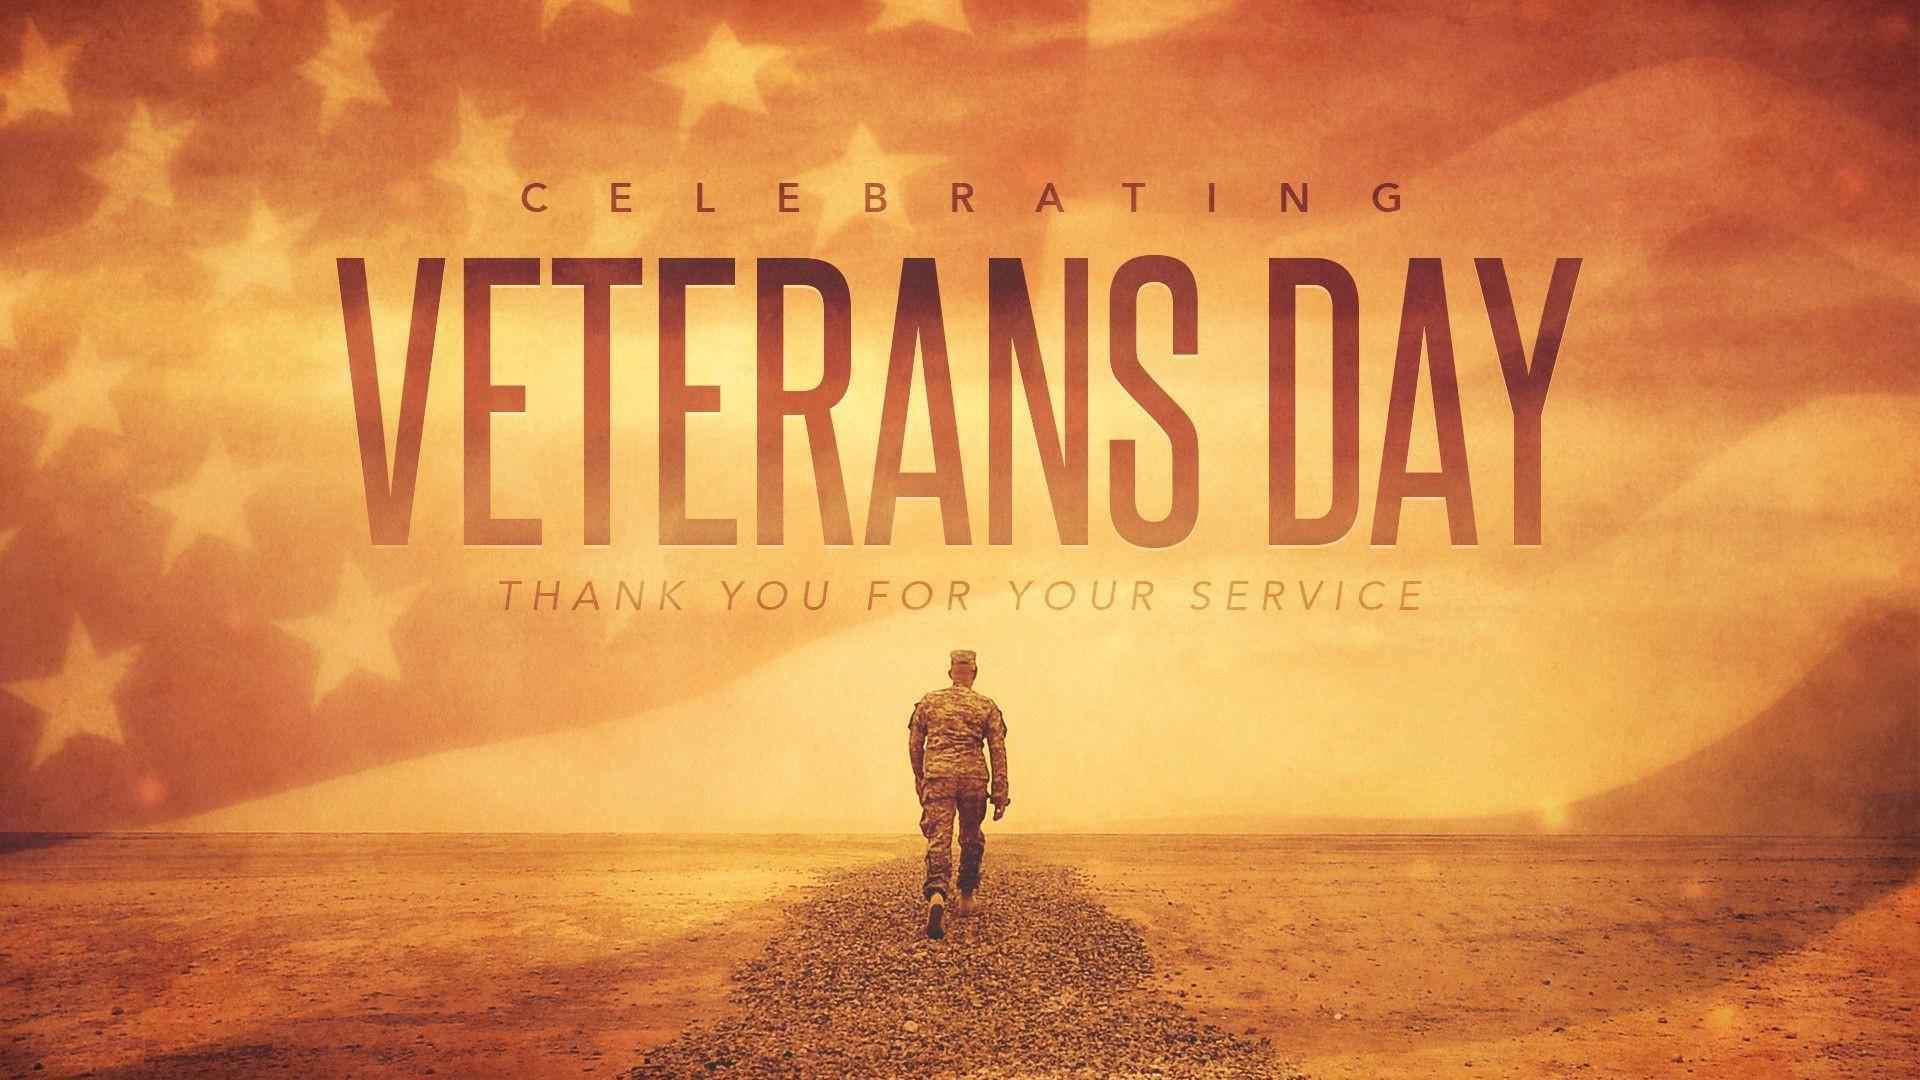 Animated Christmas Desktop Wallpaper Veterans Day Wallpapers